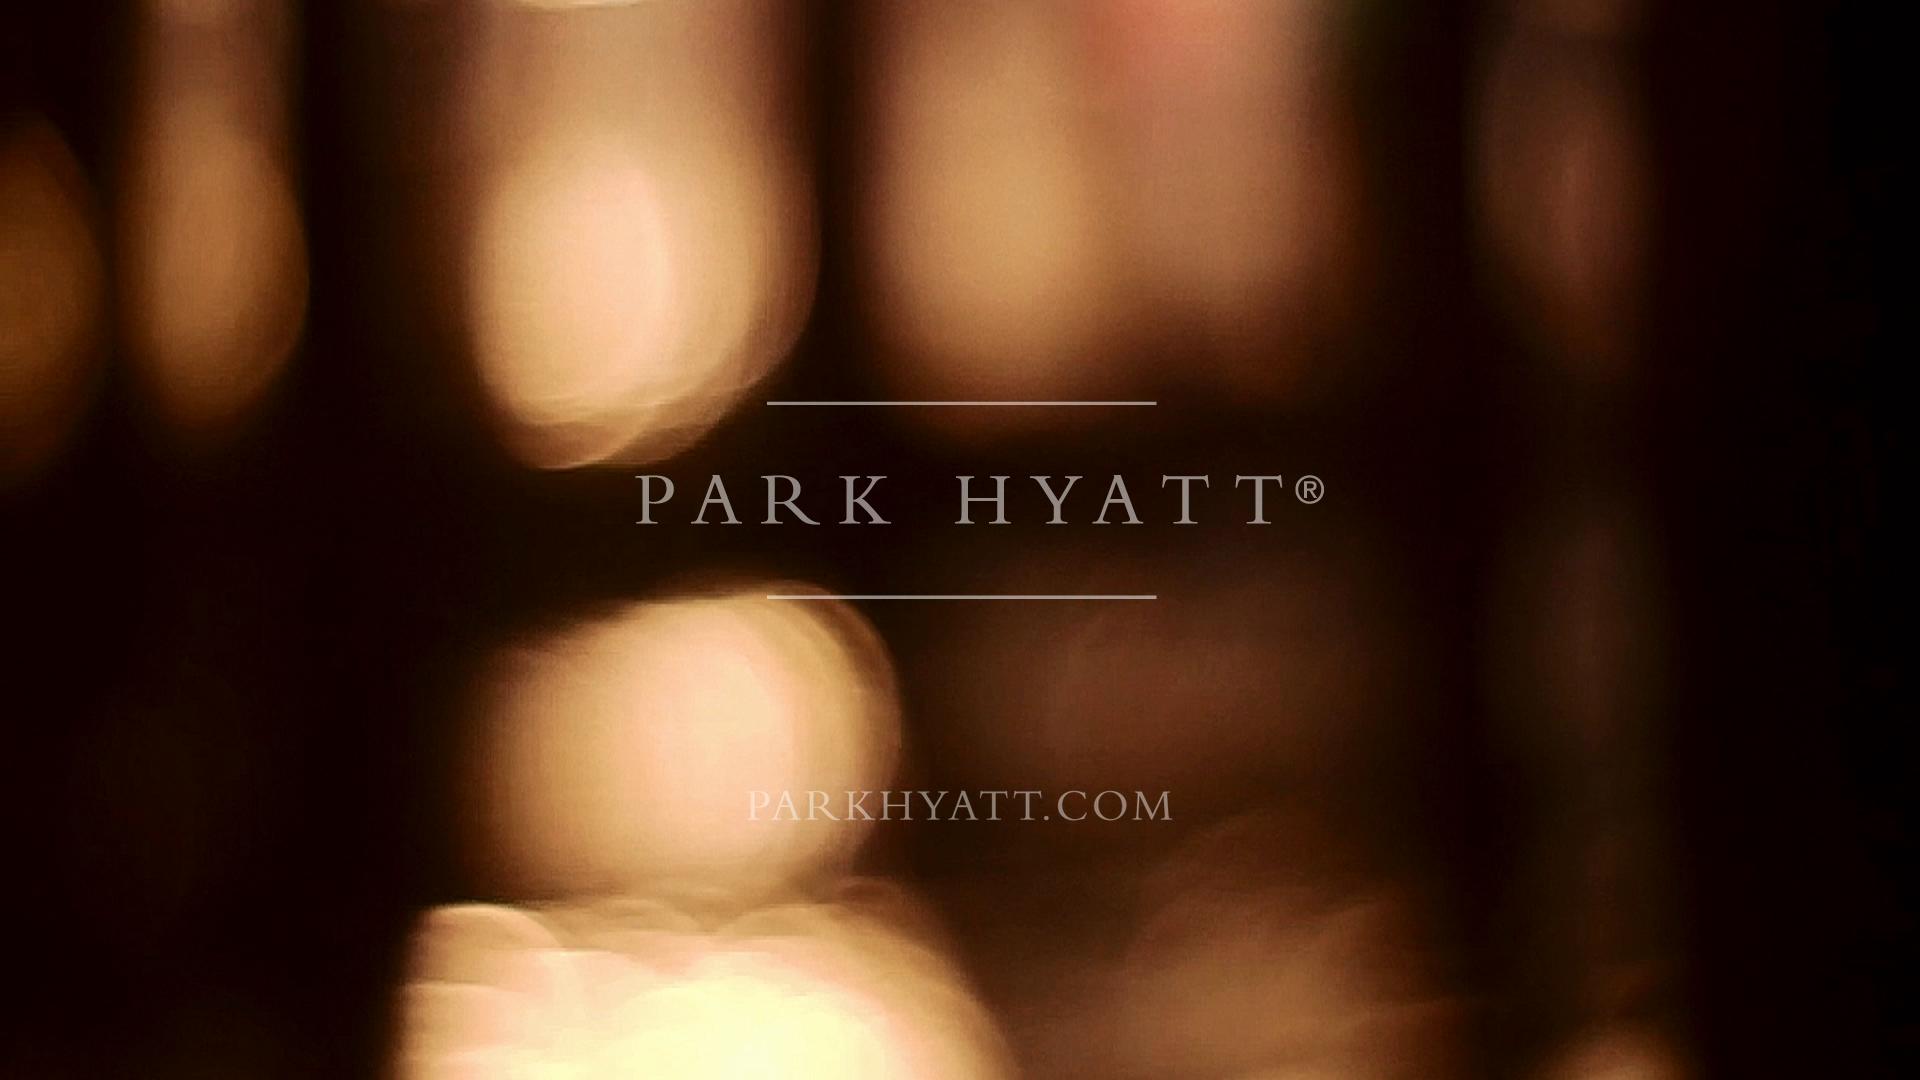 ParkHyatt_Discover_07.png